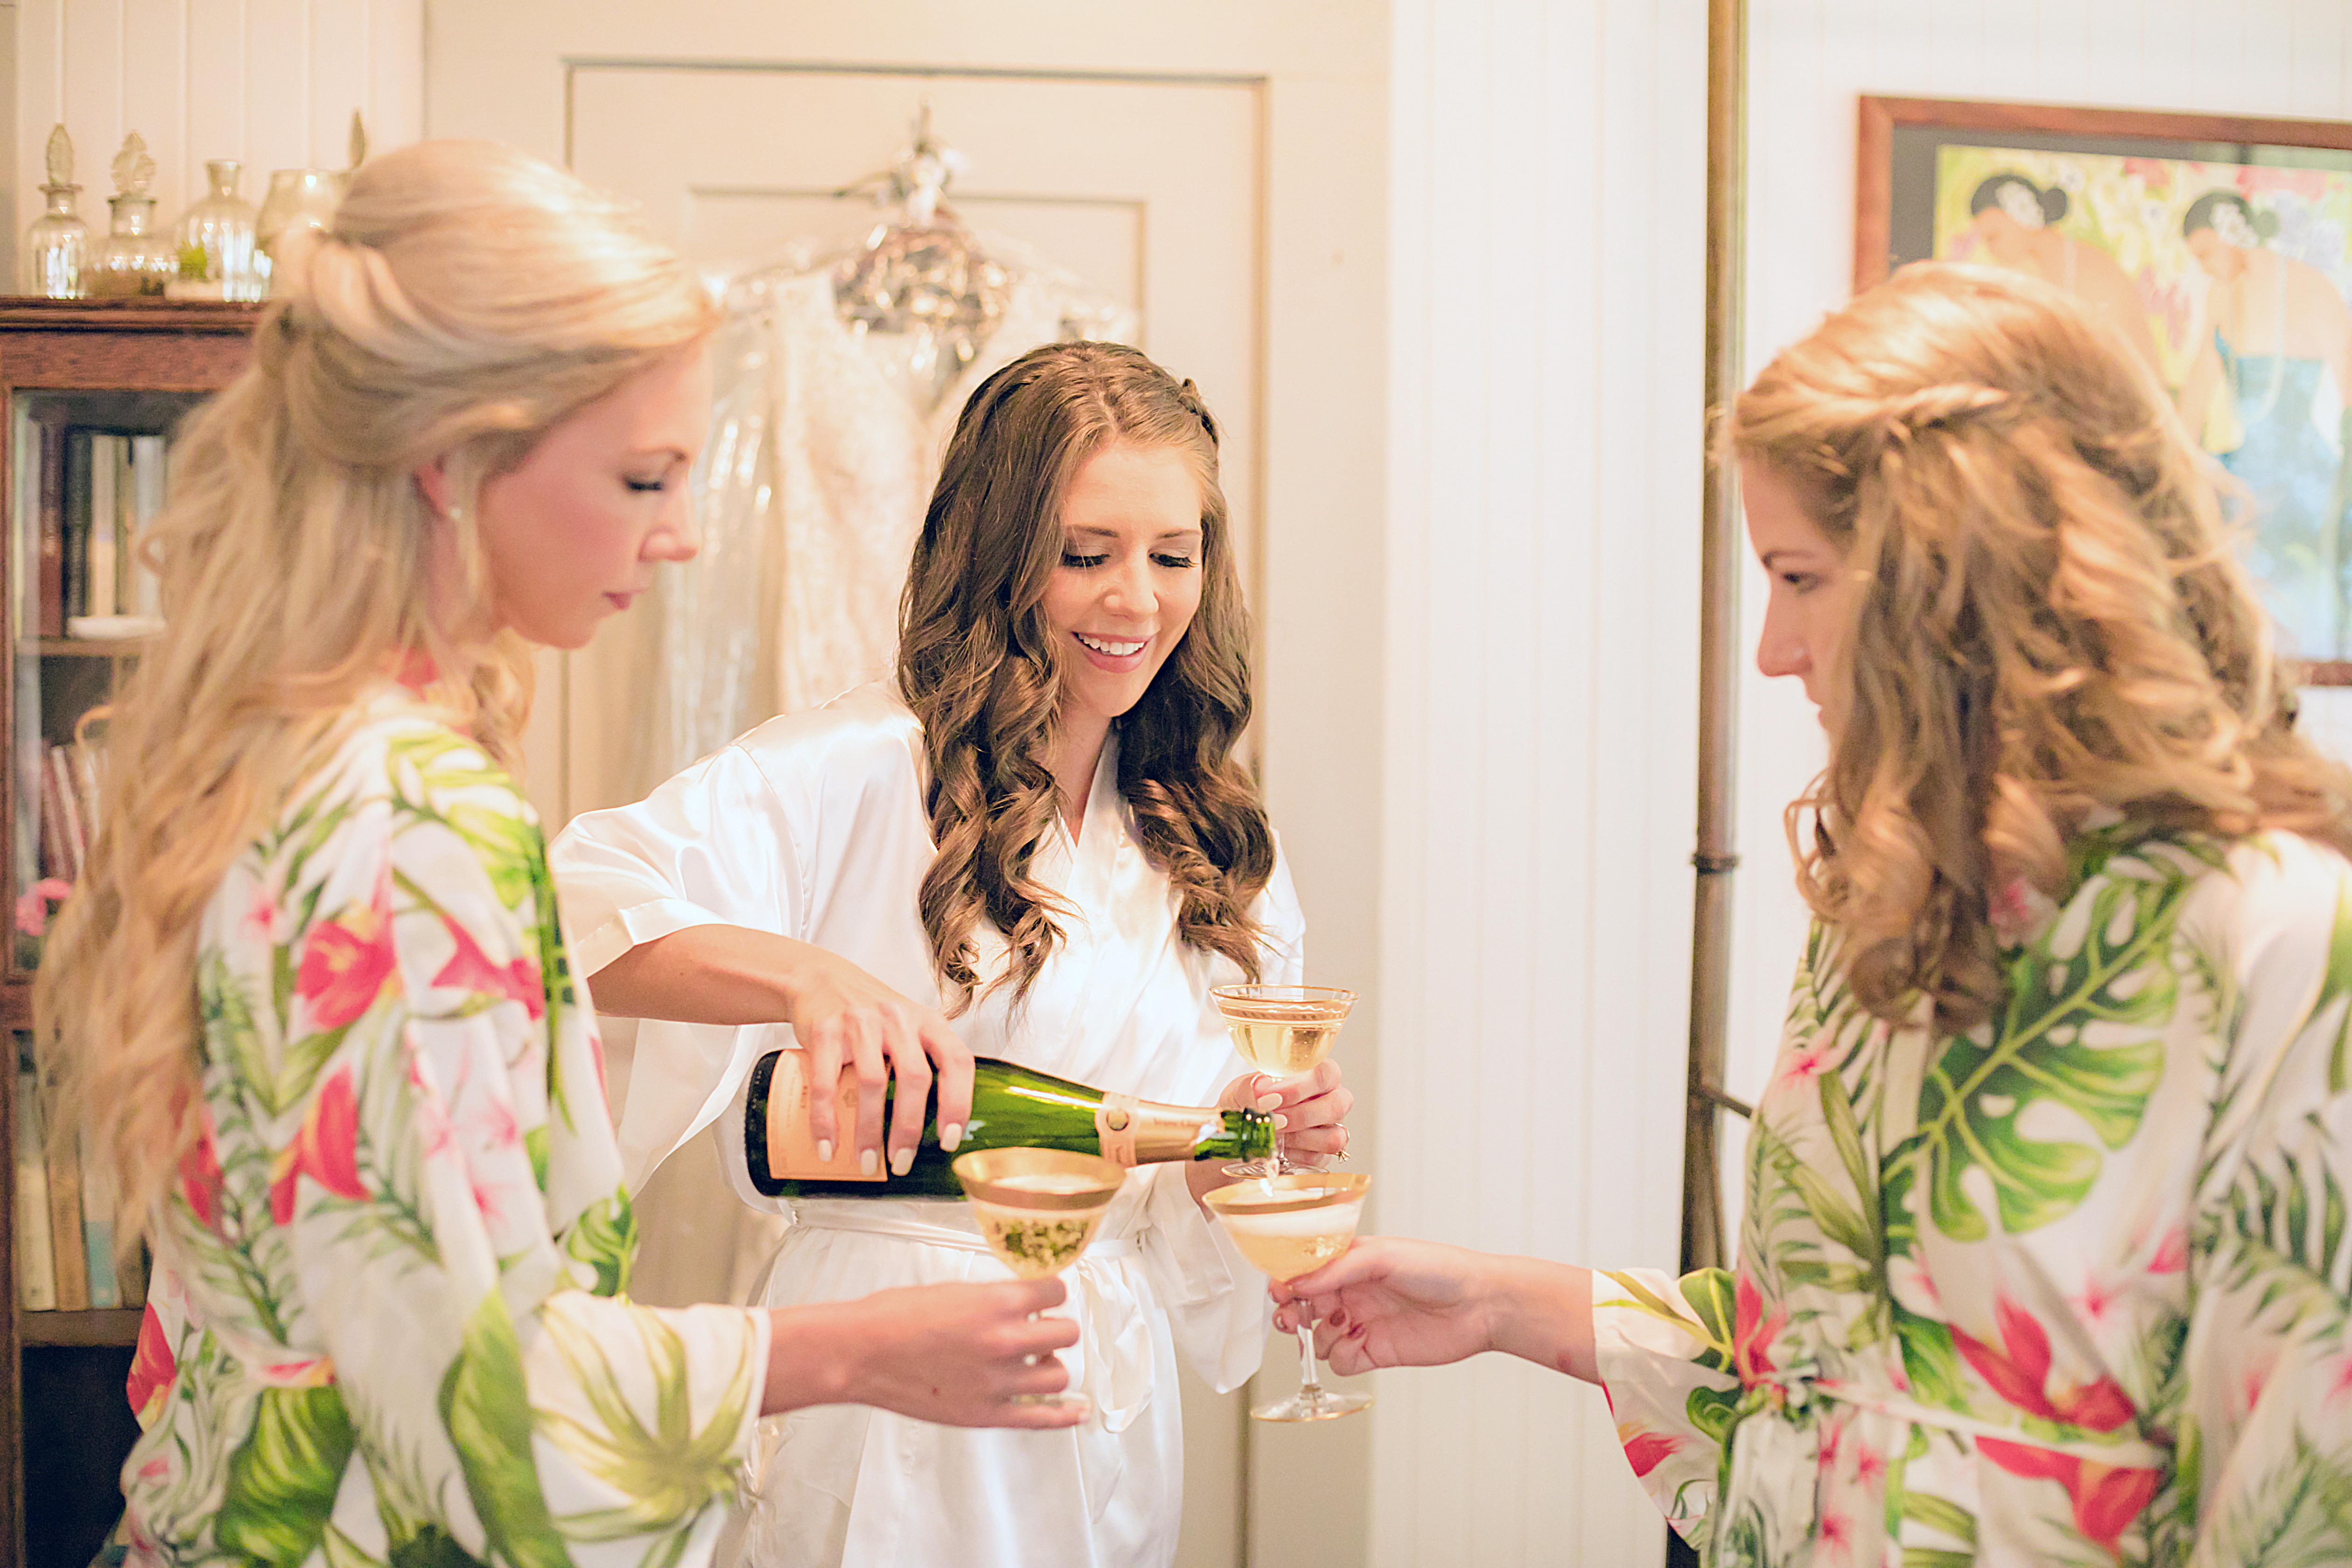 Getting ready details | Destination Wedding in Maui | Maui Wedding Planner | Maui's Angels blog